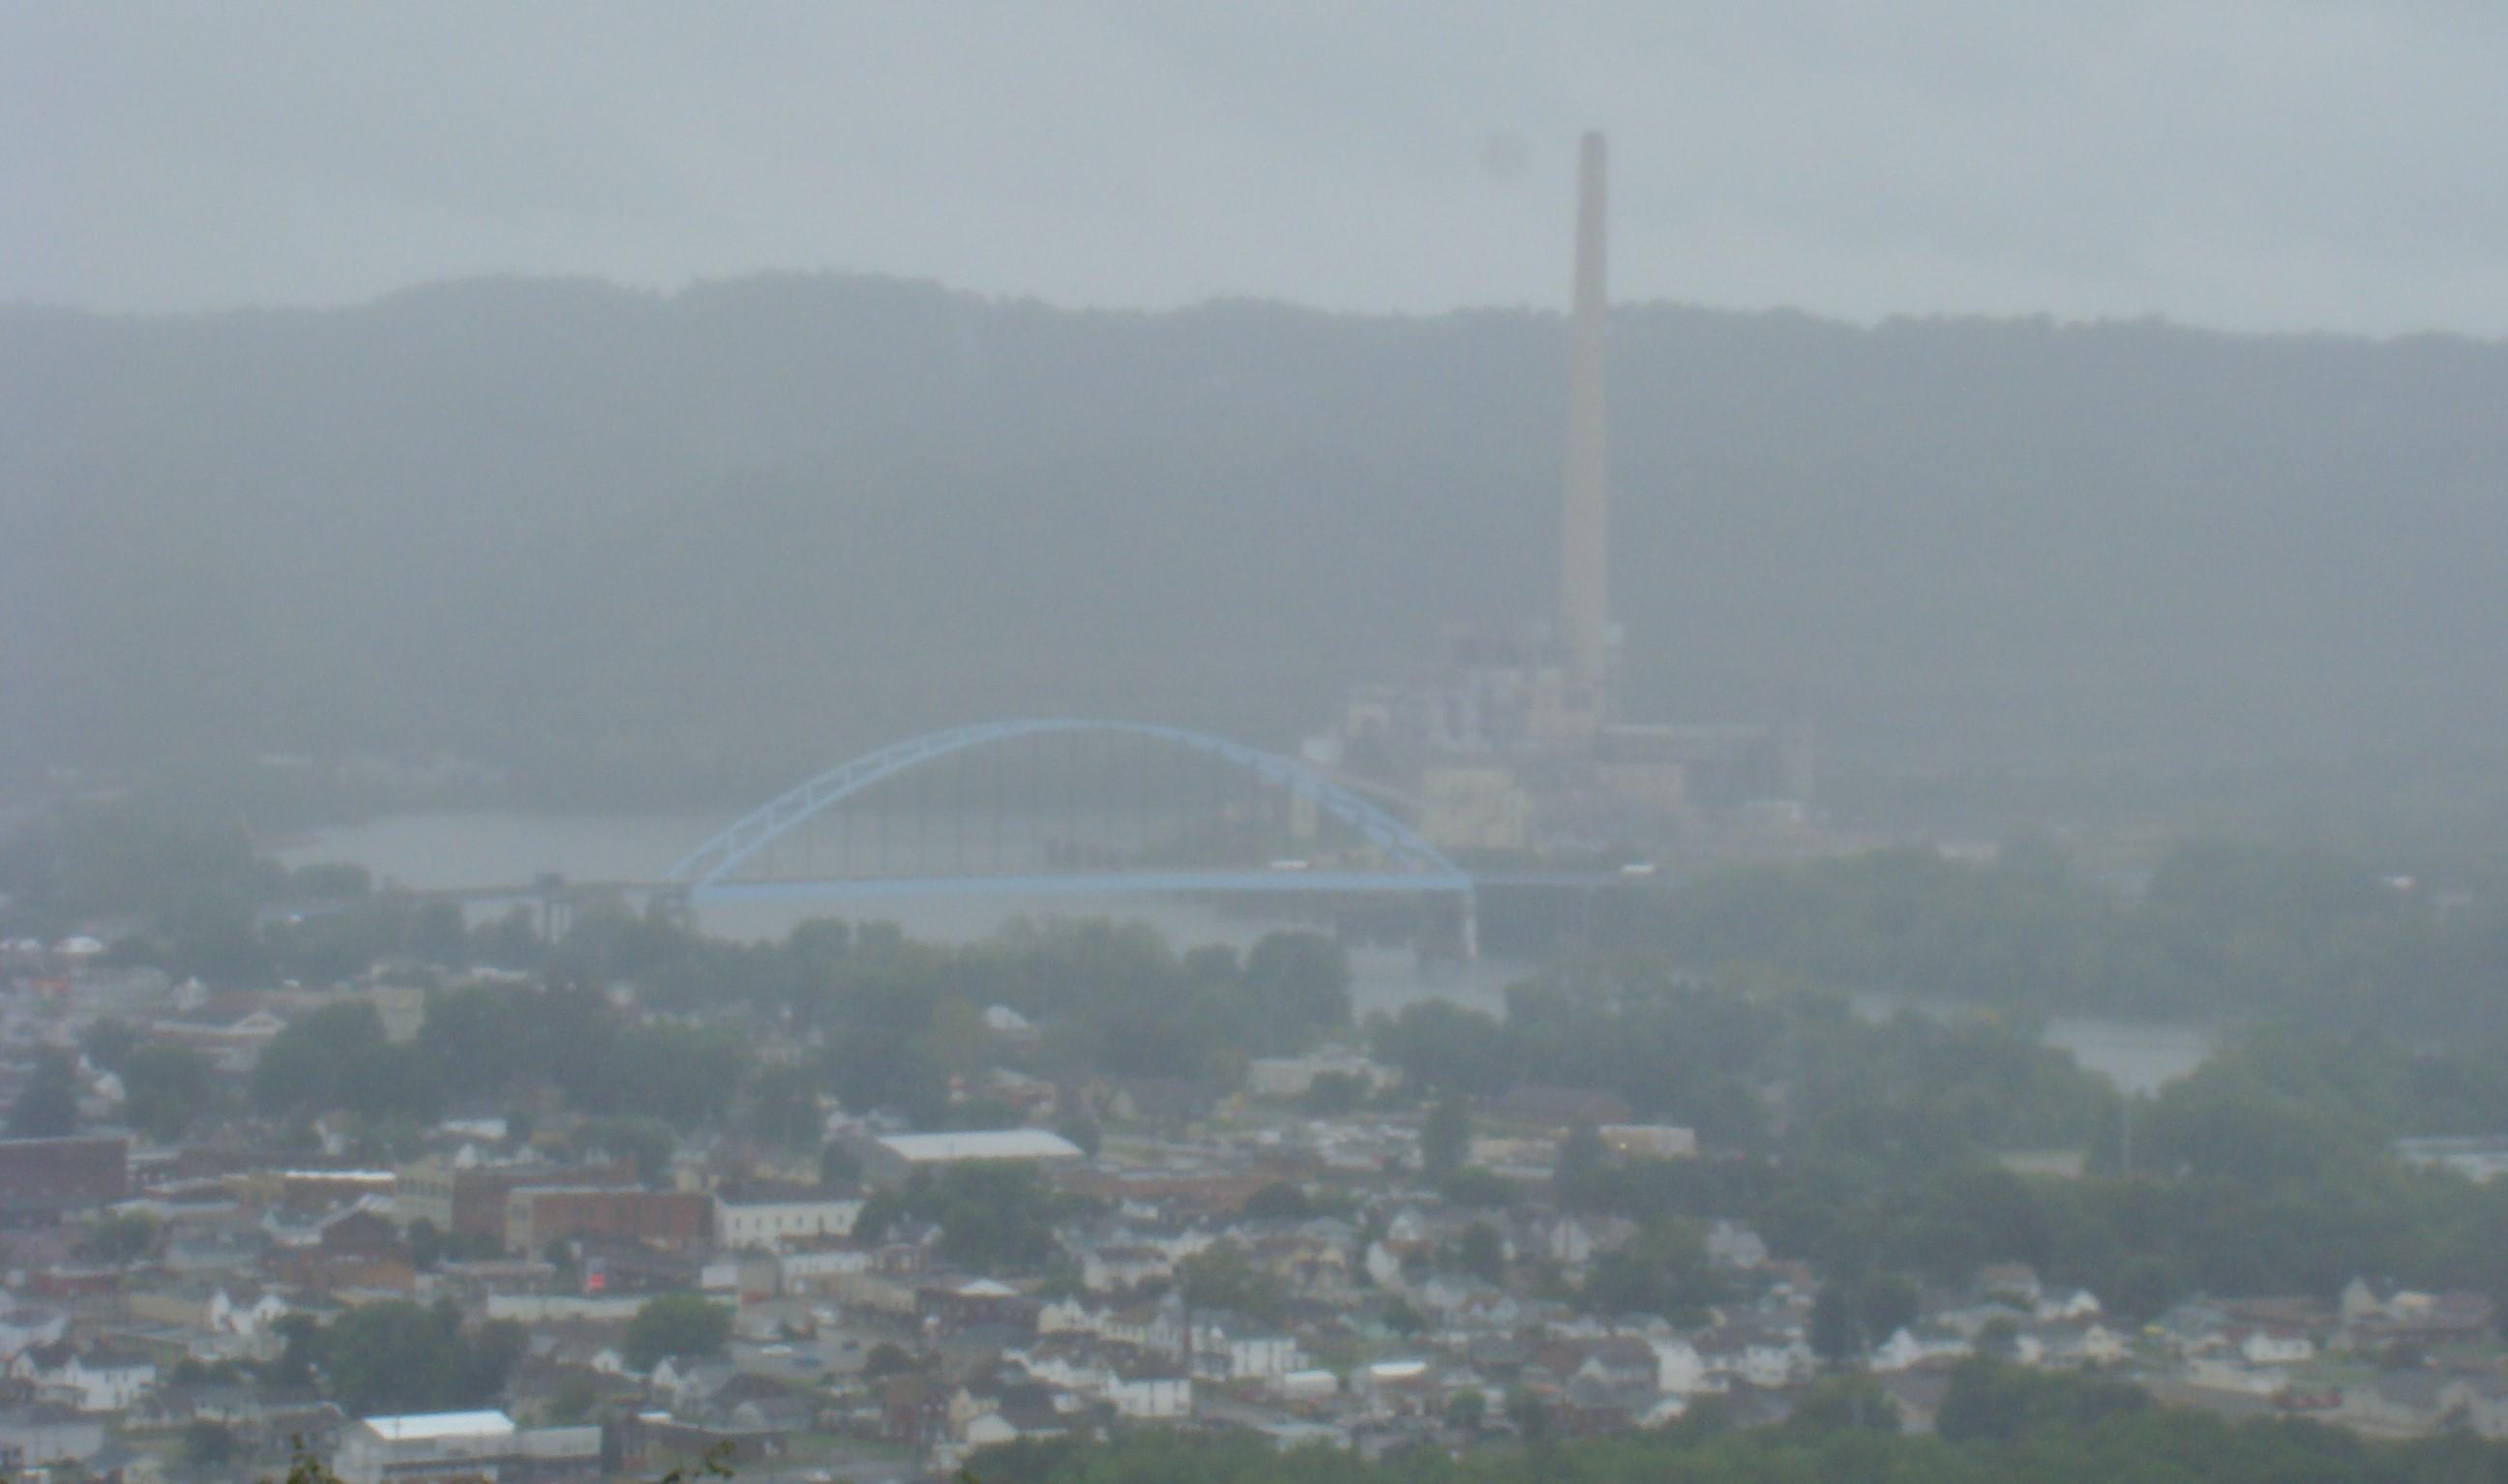 Fog over Ohio River